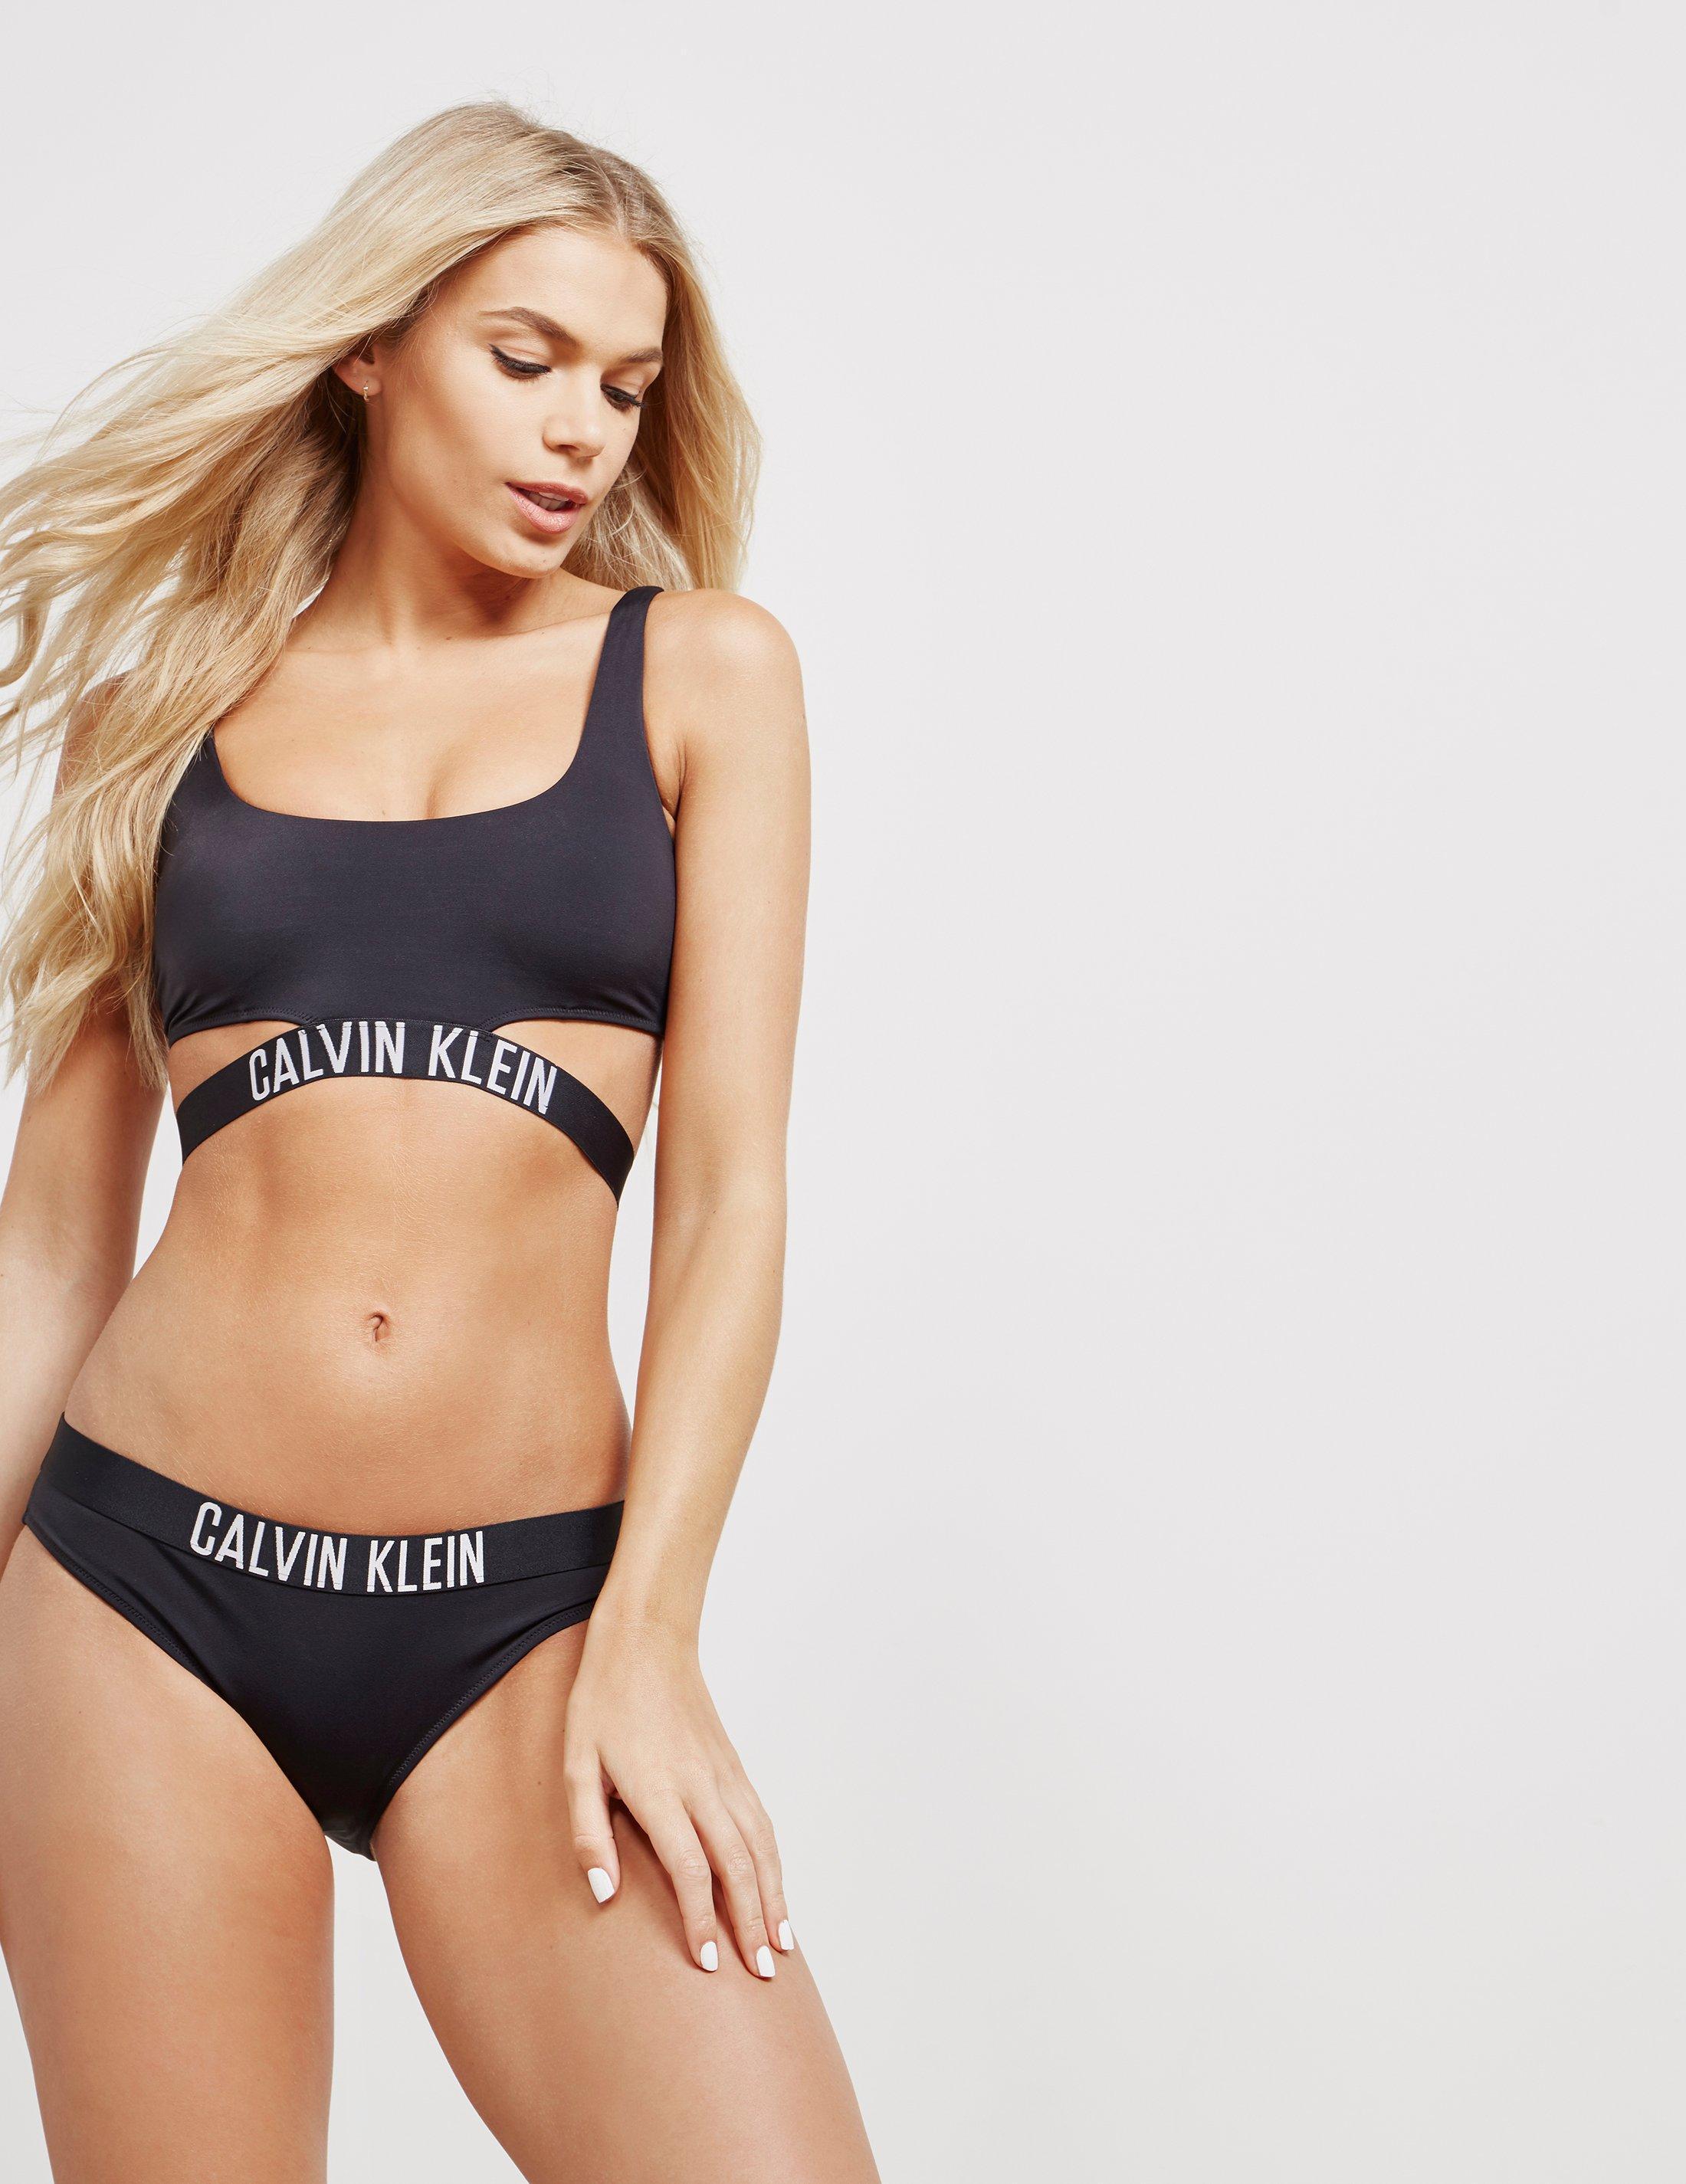 cfc38cc305 Calvin Klein Womens Intense Power Strap Bikini Top - Online ...